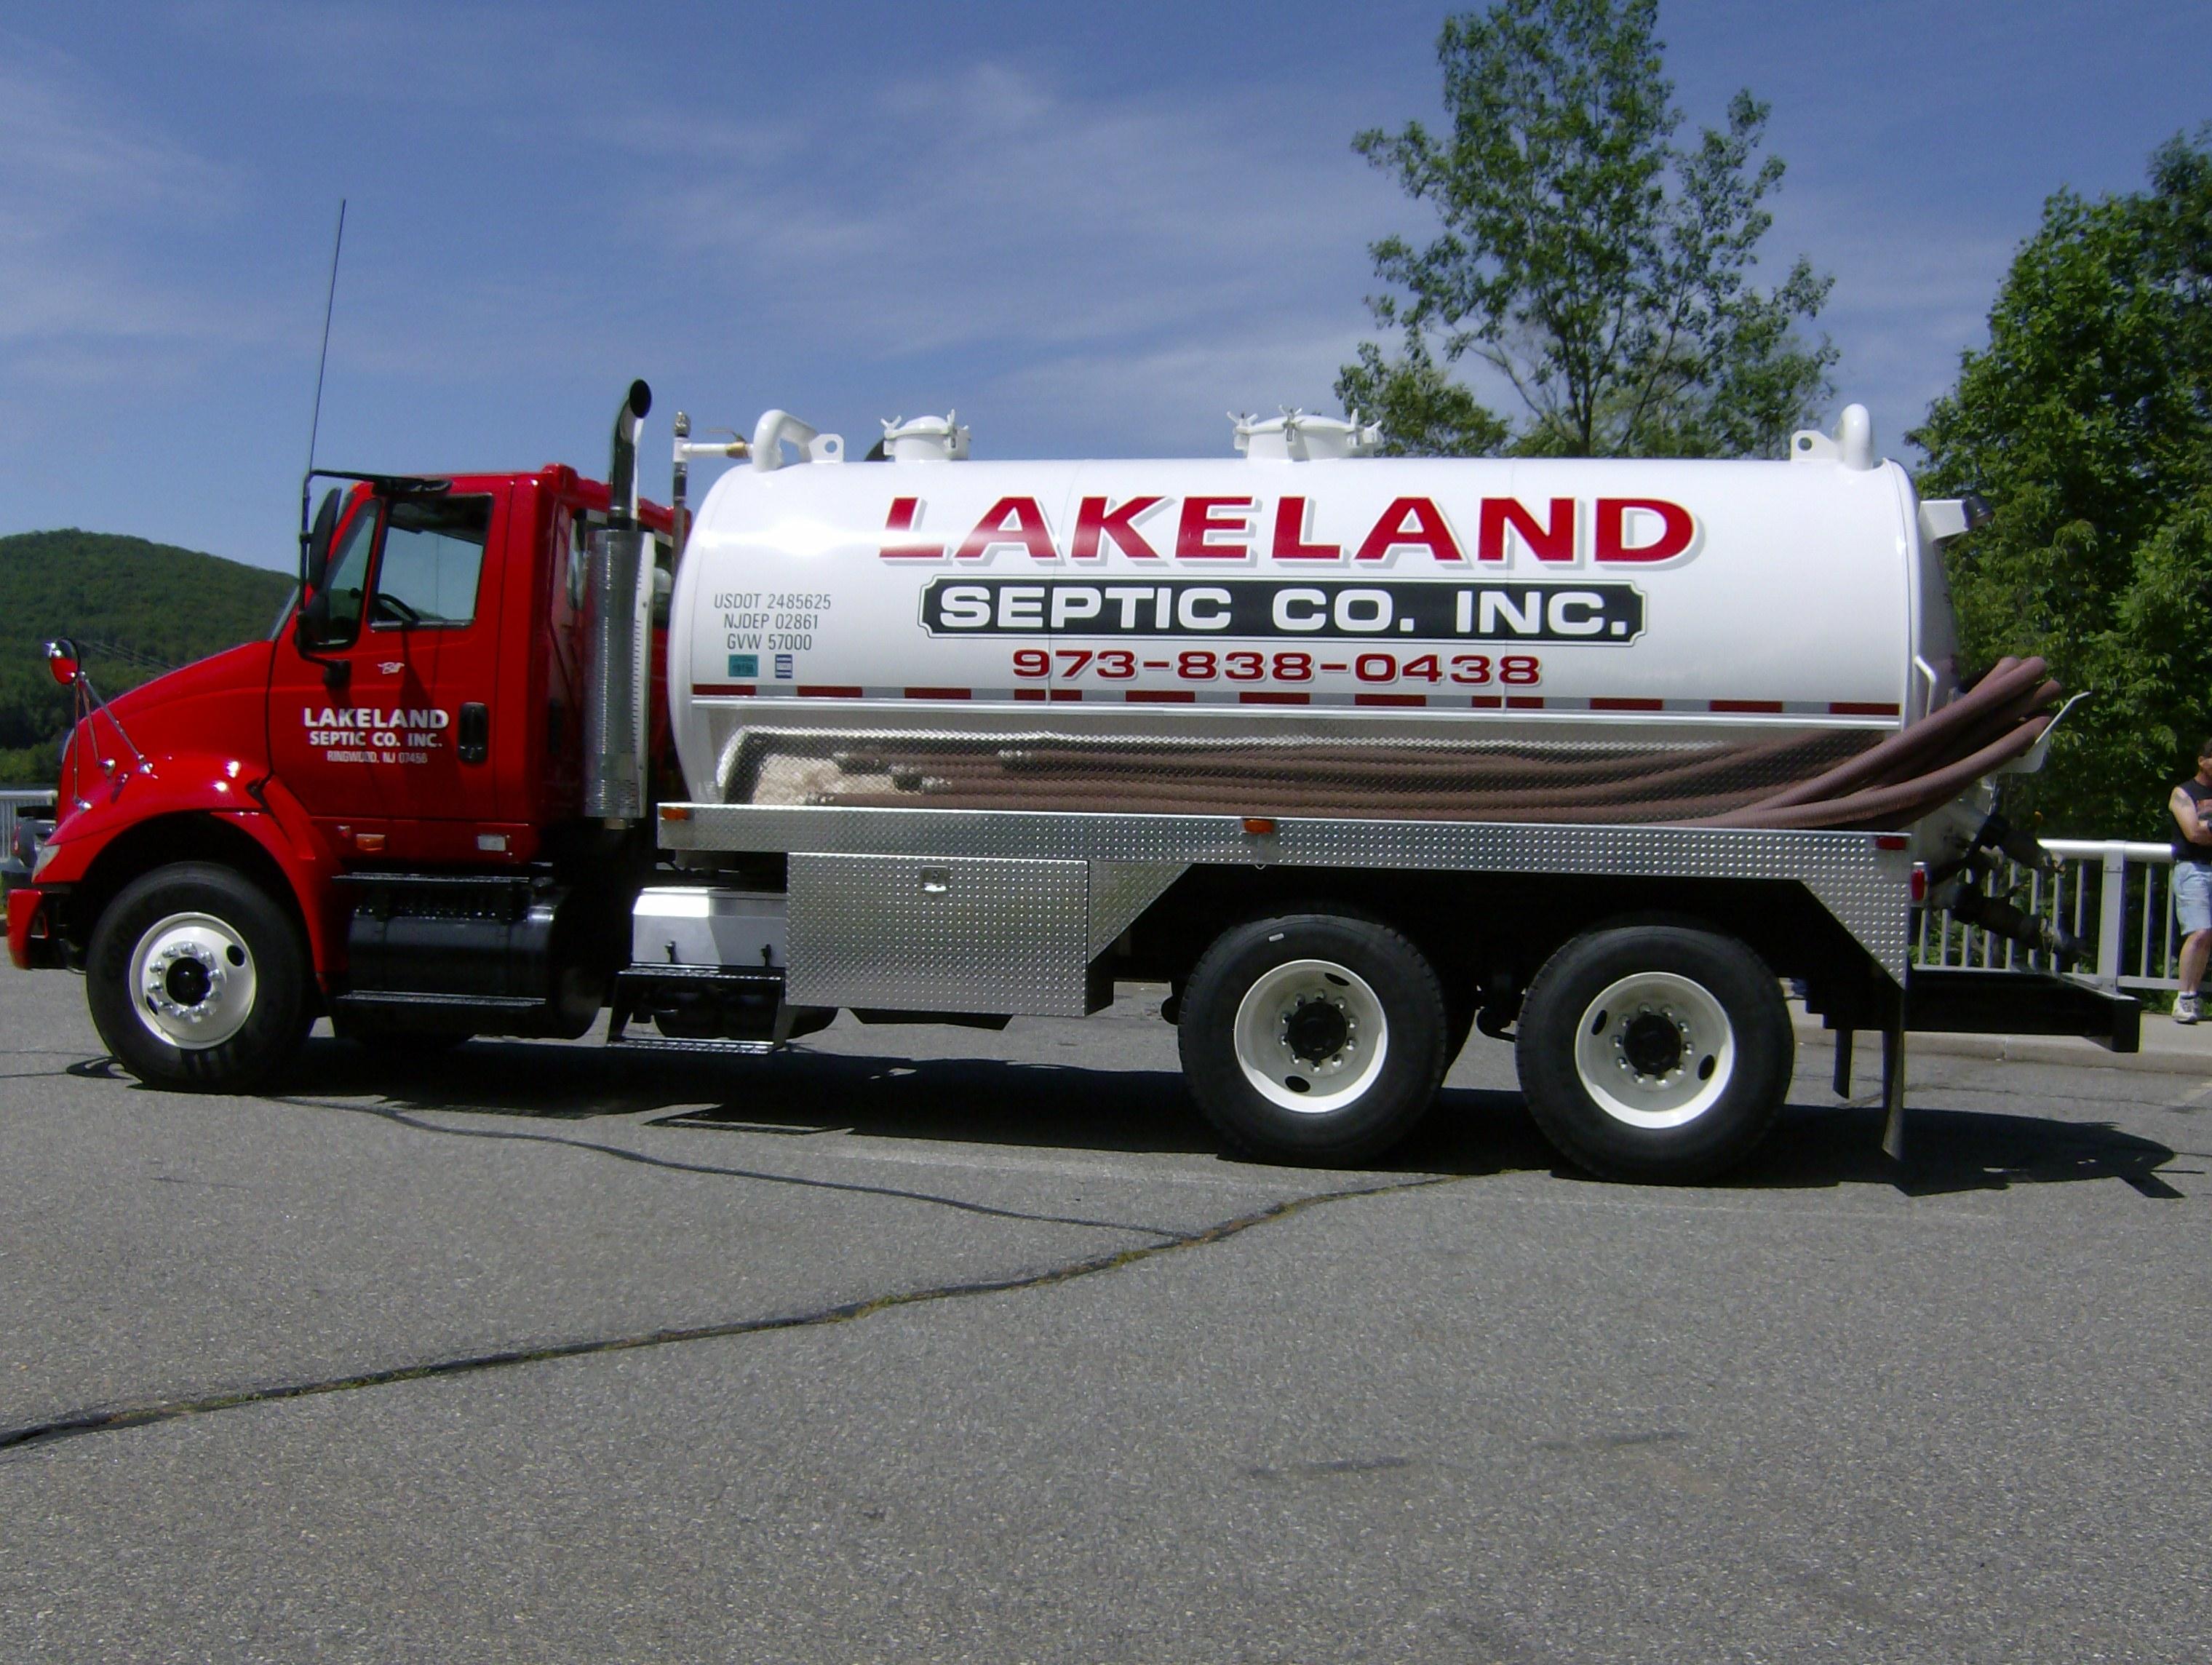 Lakeland Septic Co Inc - Ringwood, NJ 07456 - (973)838-0438   ShowMeLocal.com